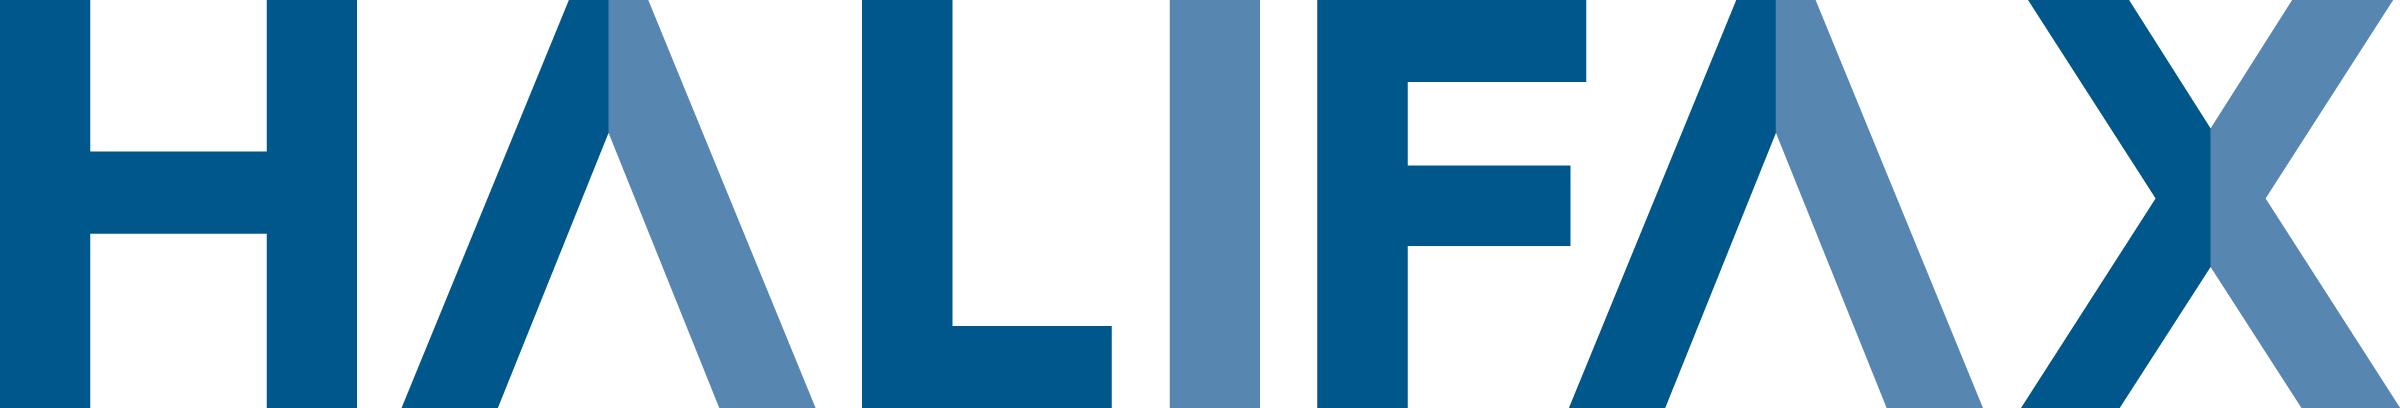 Halifax_Logo_PrimaryBlue_CMYK_Tint large.jpg